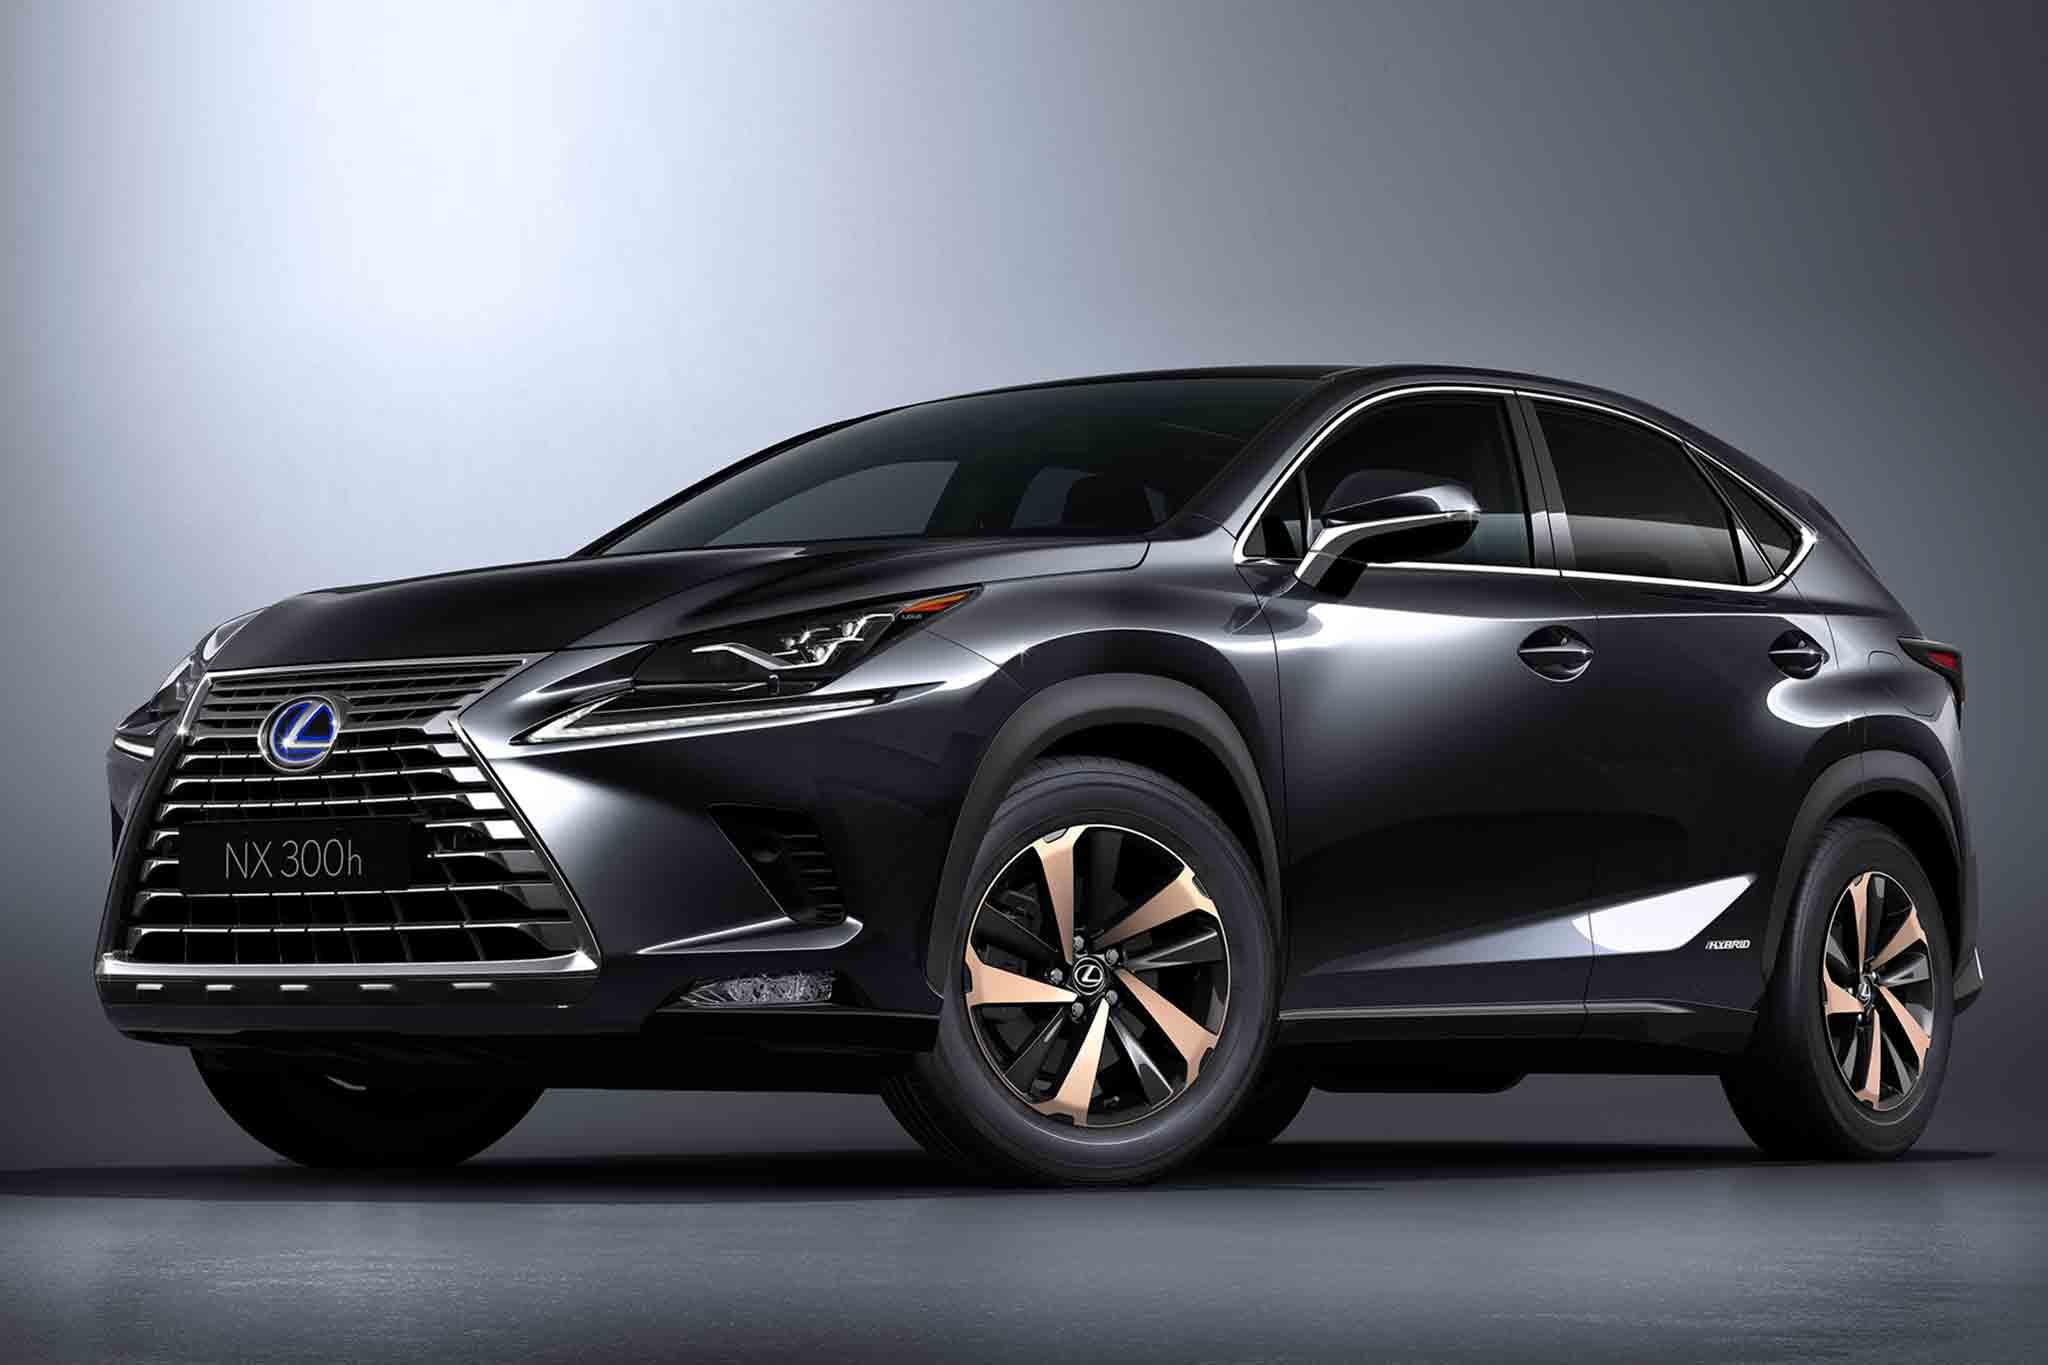 2018 Lexus Nx Shows Off New Design In Shanghai Automobile Magazine